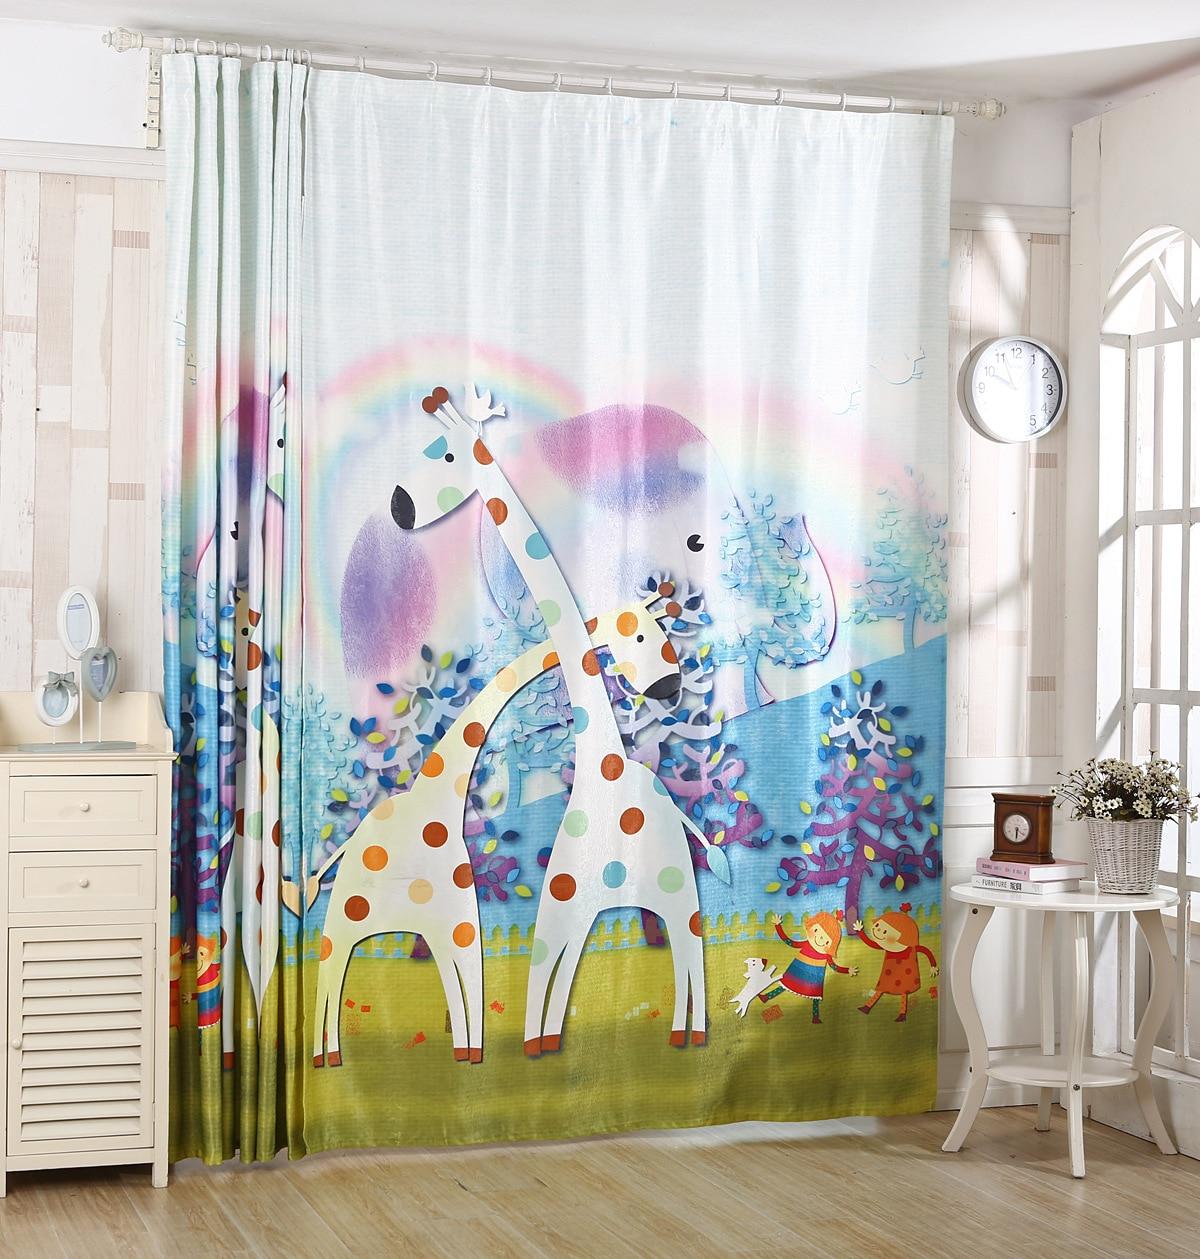 2016 New Korean 3D Printing Color Shade Curtains Children Cartoon Deer Product Customization